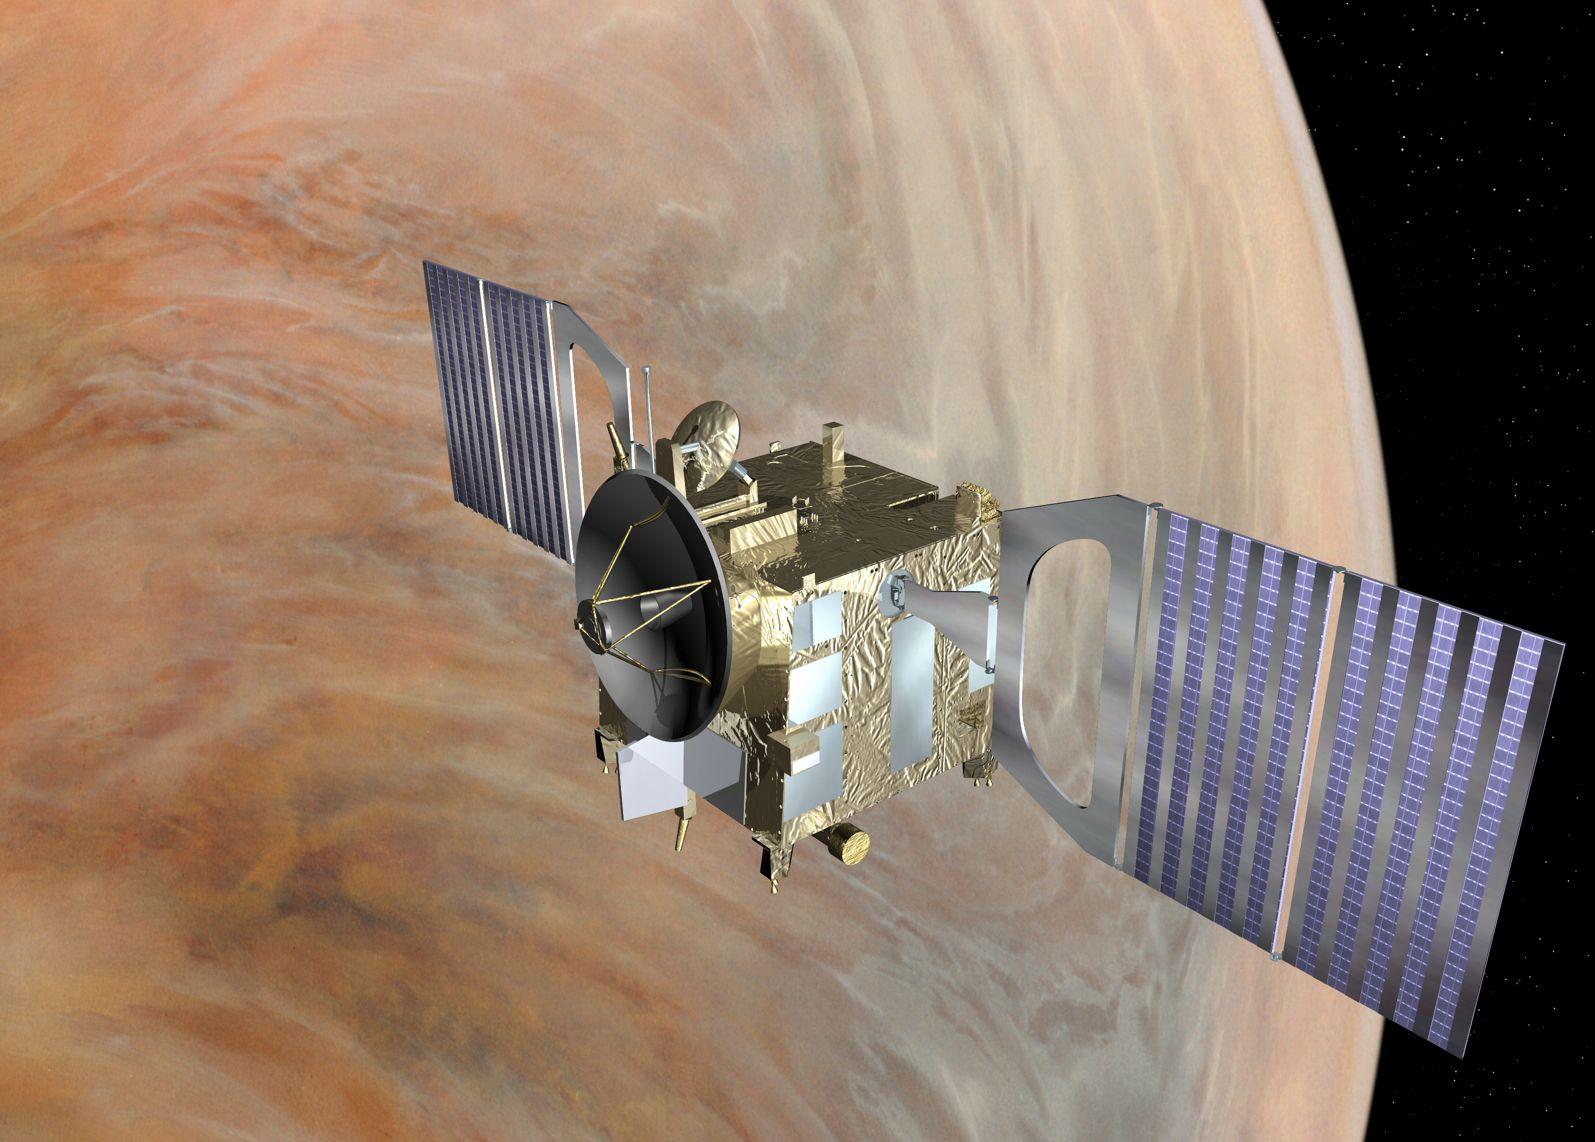 У Venus Express закончилось топливо (3 фото)